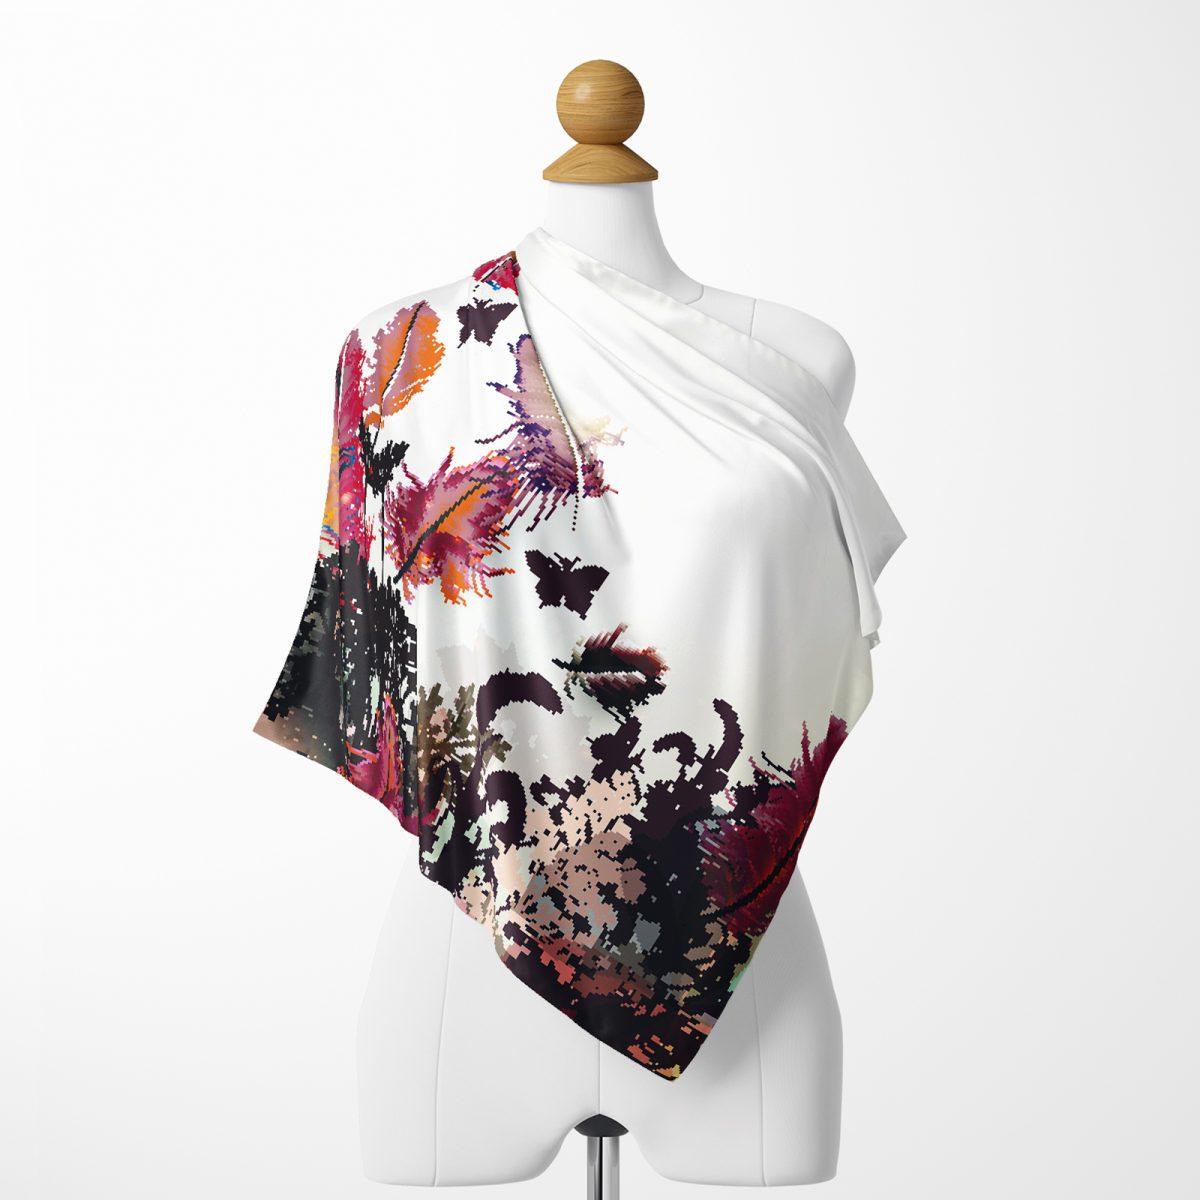 Realhomes Moda Butterfly Dijital Baskılı Modern İpeksi Twill Eşarp Realhomes